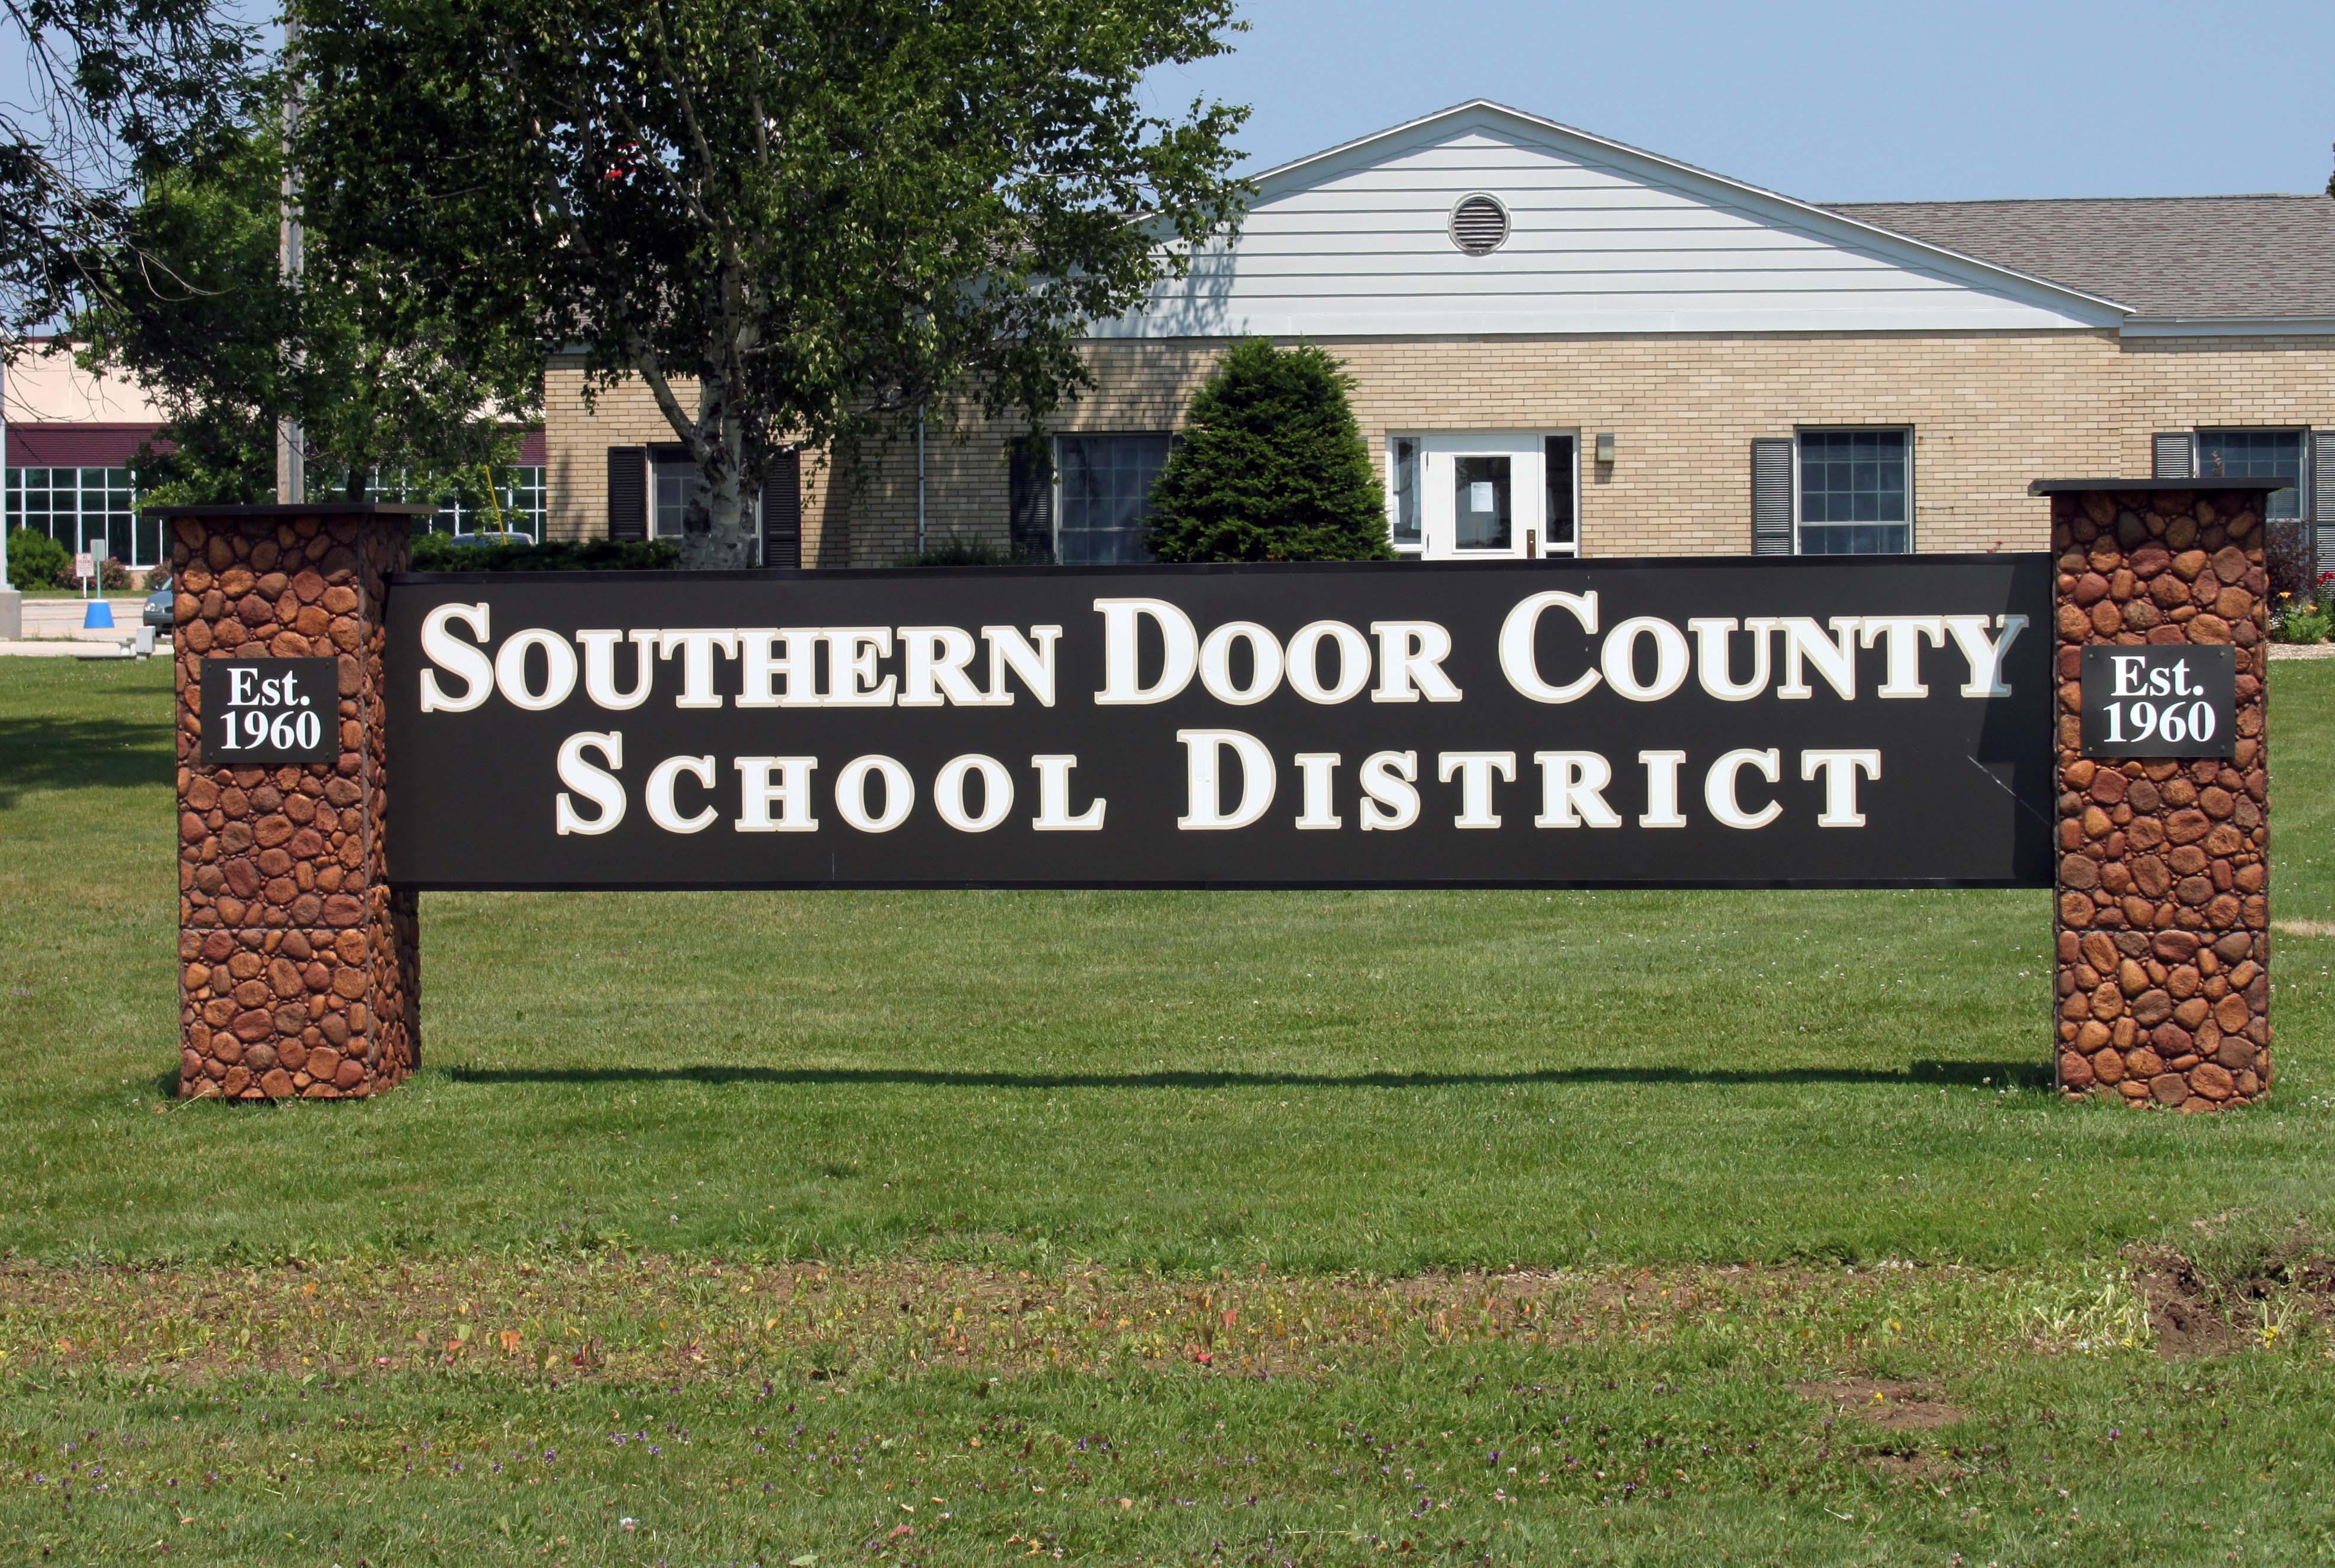 SOUTHERN DOOR COUNTY